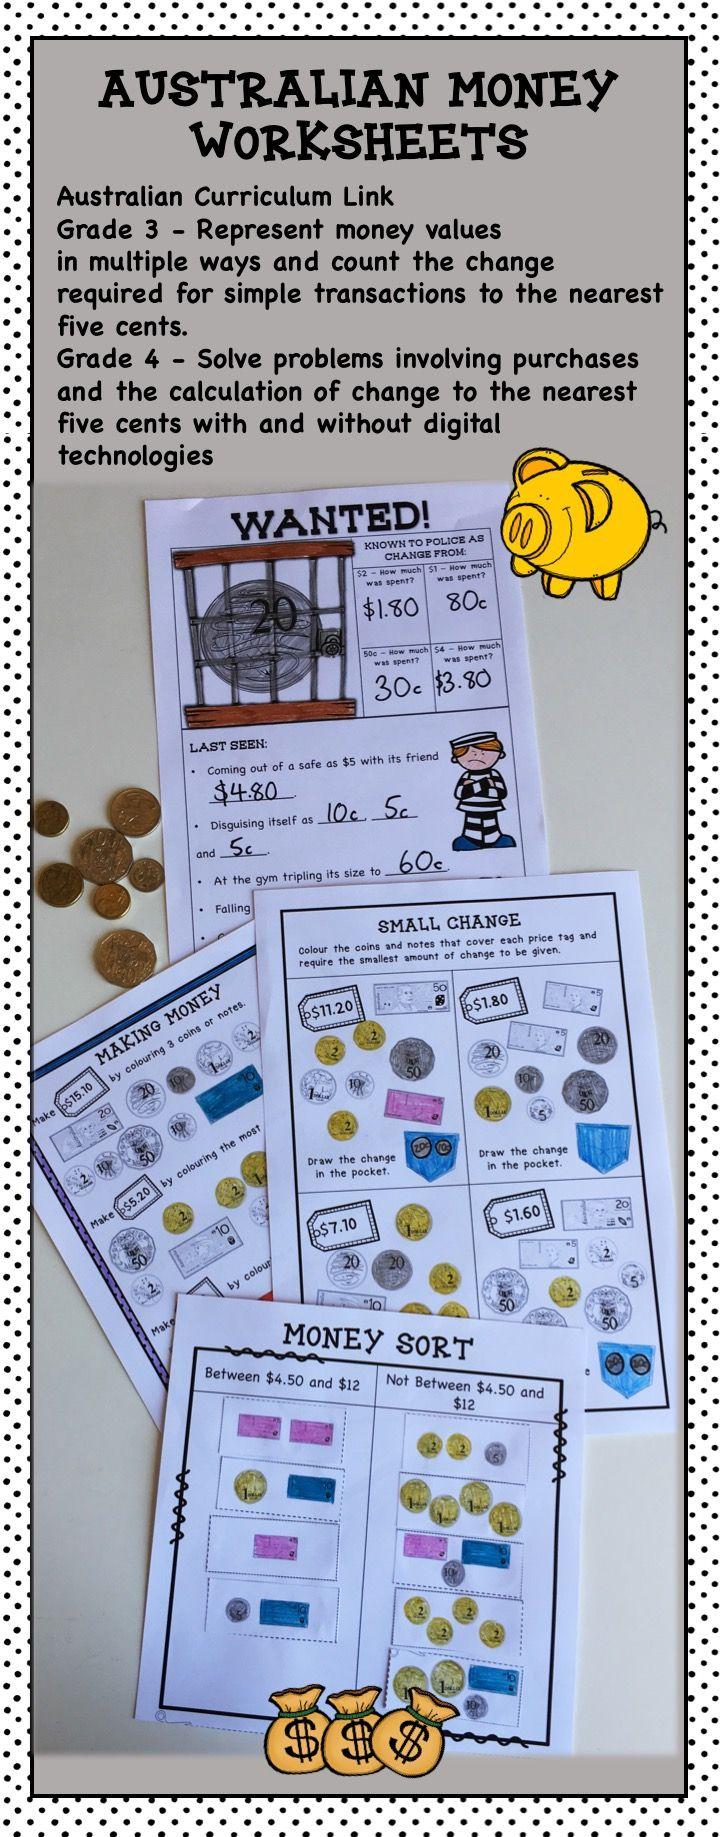 australian money worksheets higher order thinking hots grade 3 and 4 1st grade math. Black Bedroom Furniture Sets. Home Design Ideas